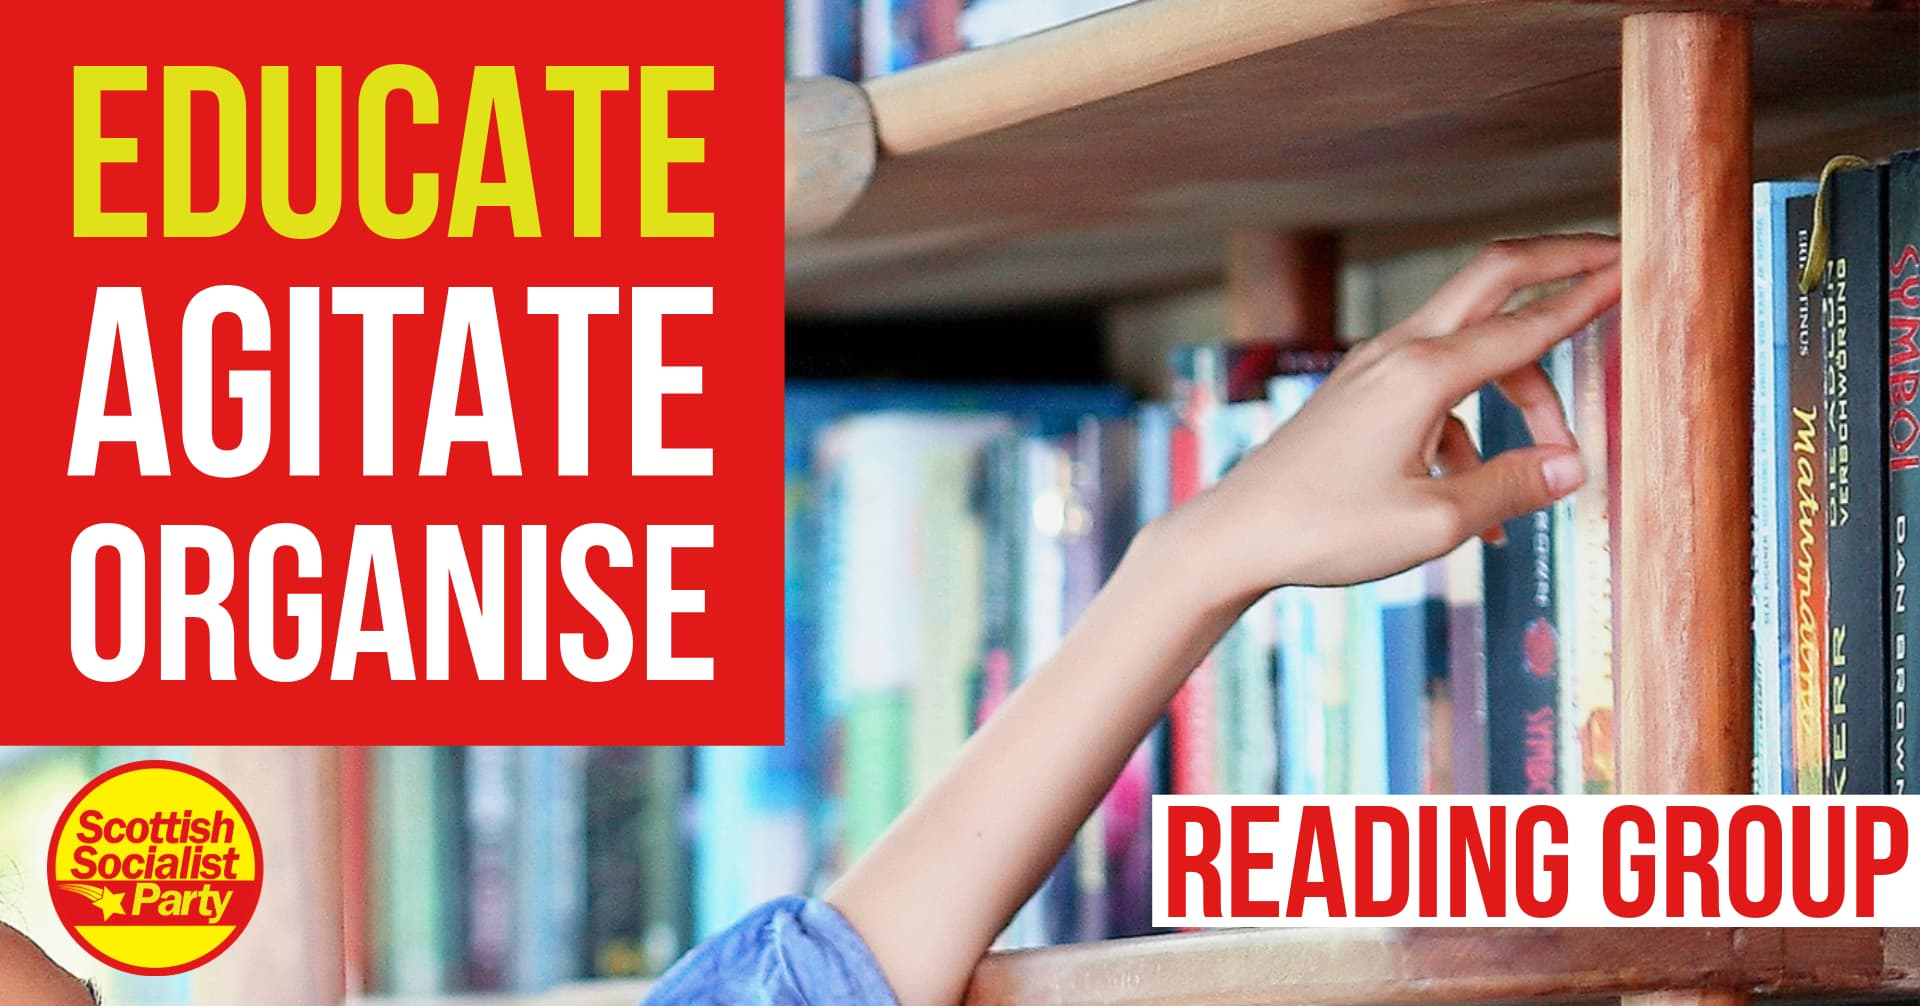 Educate Agitate Organise - a hand reaches up to a bookshelf.